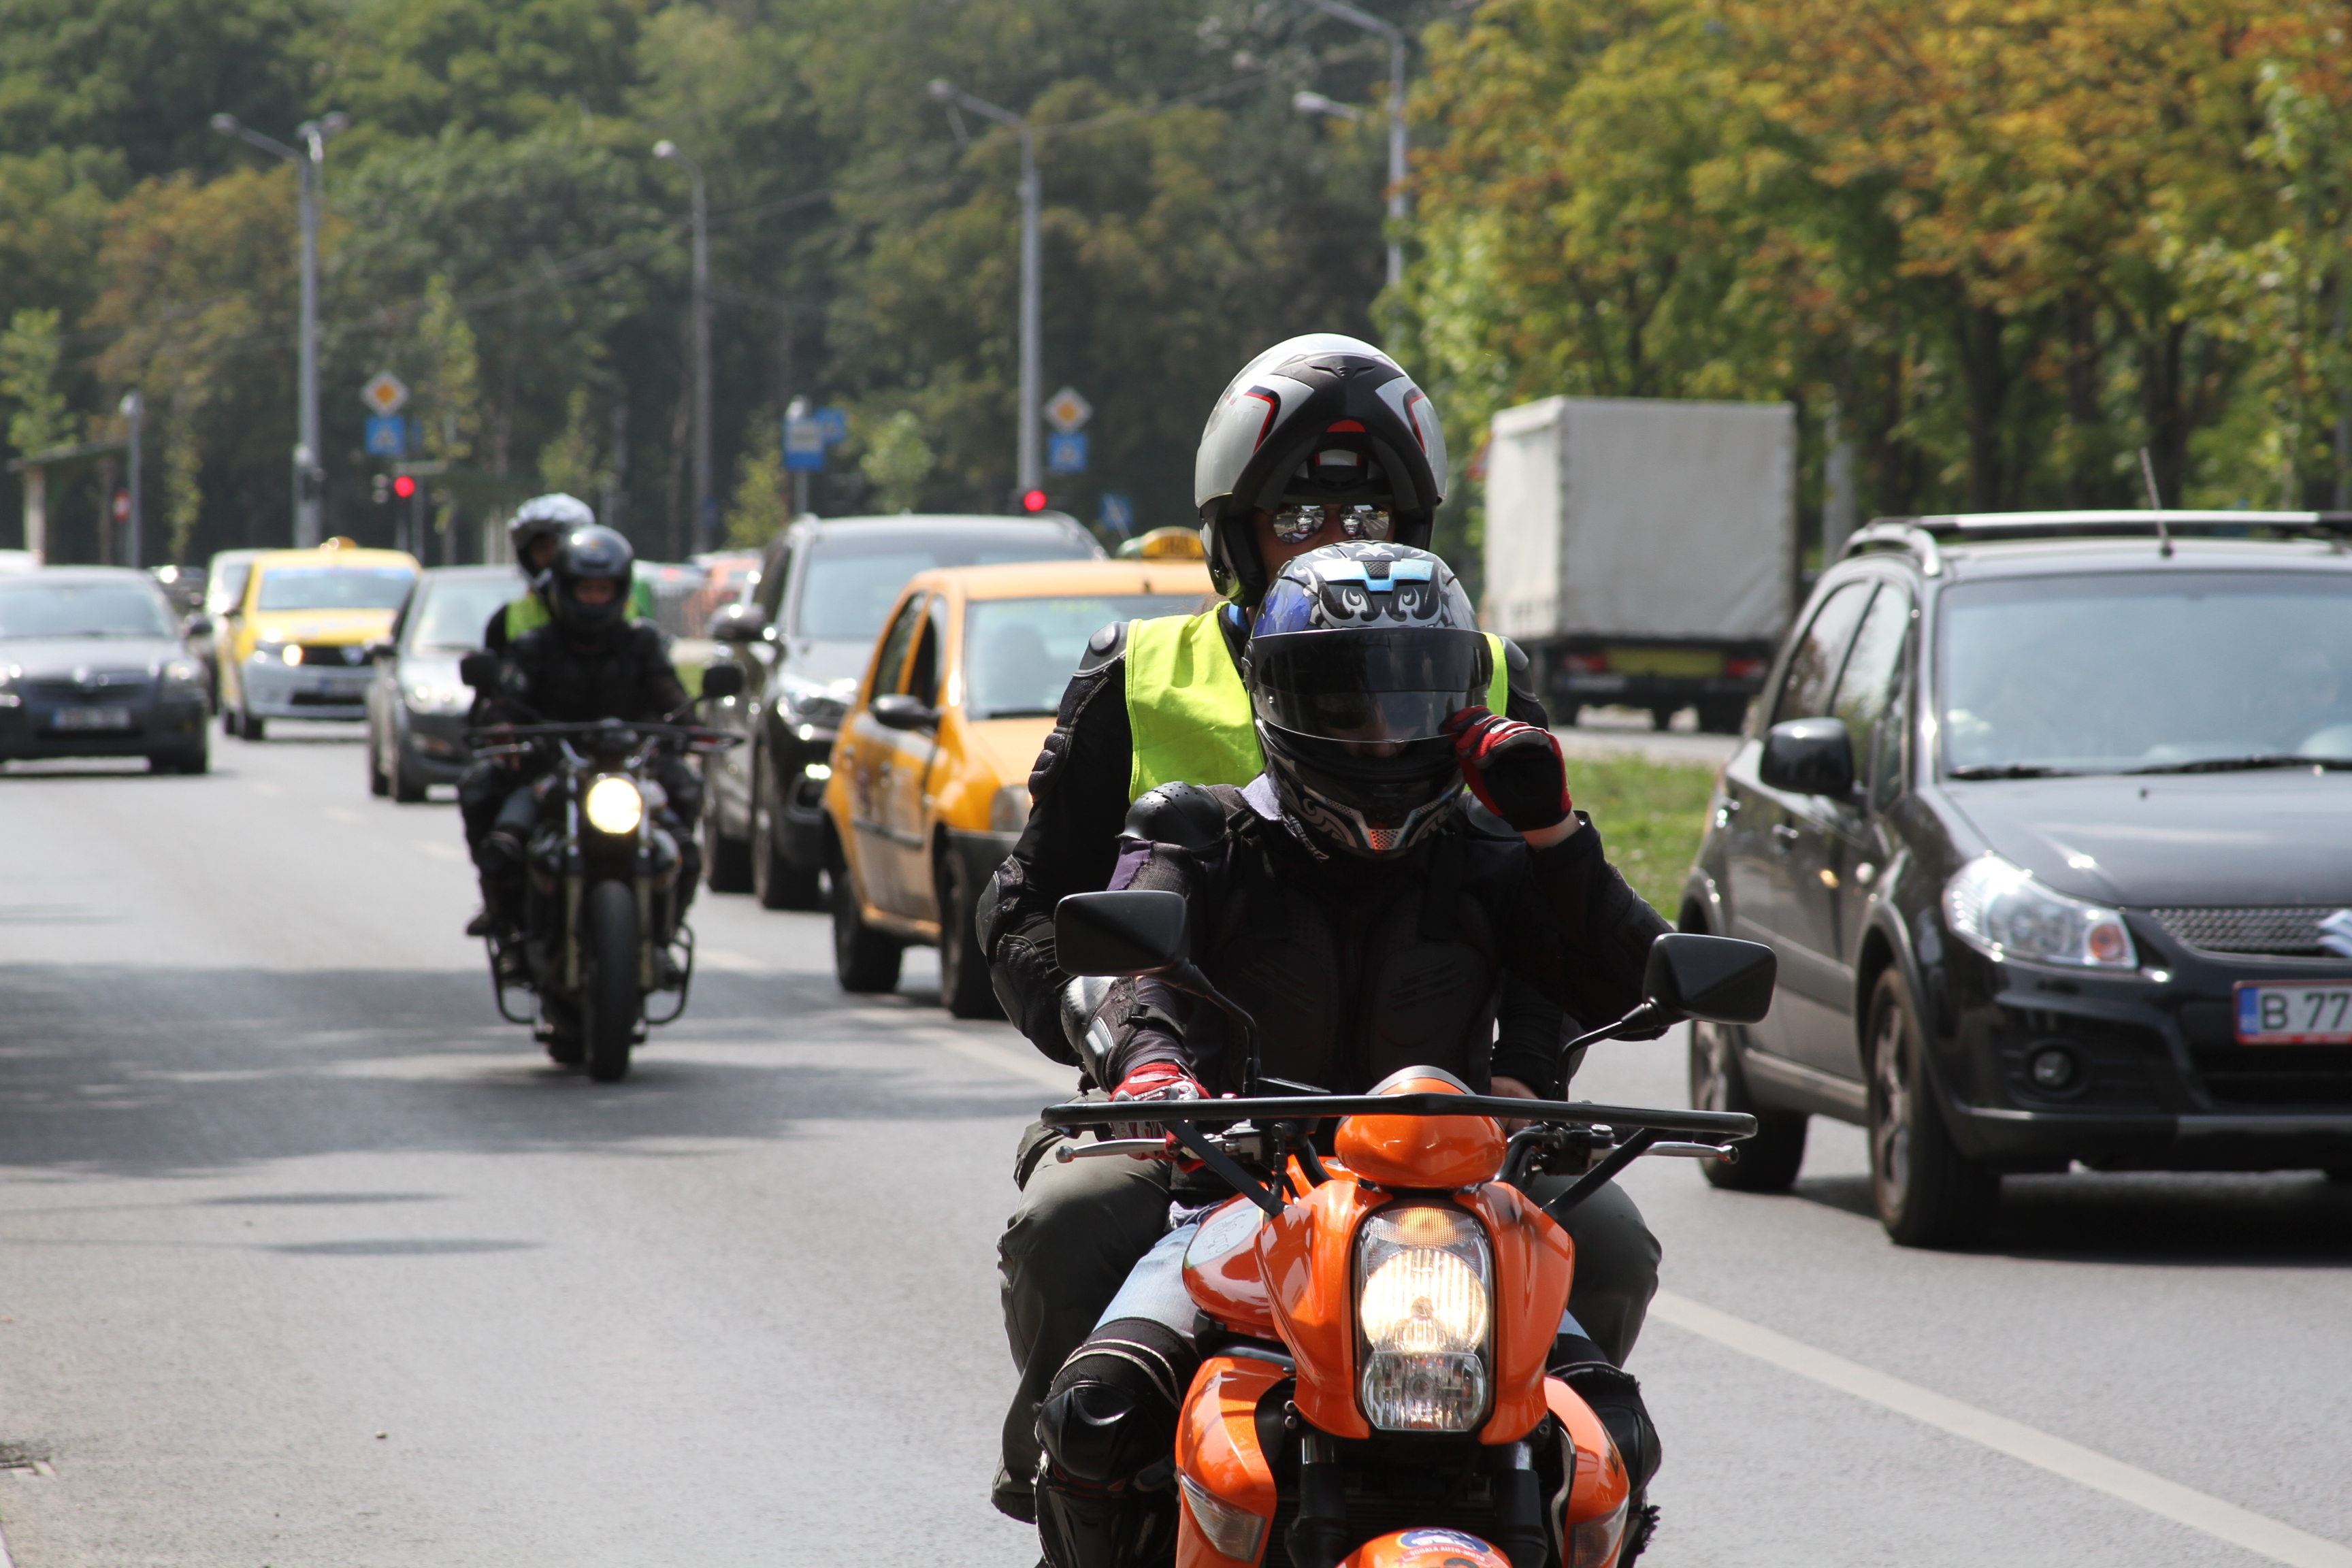 scoala moto ami examen moto cu pasager